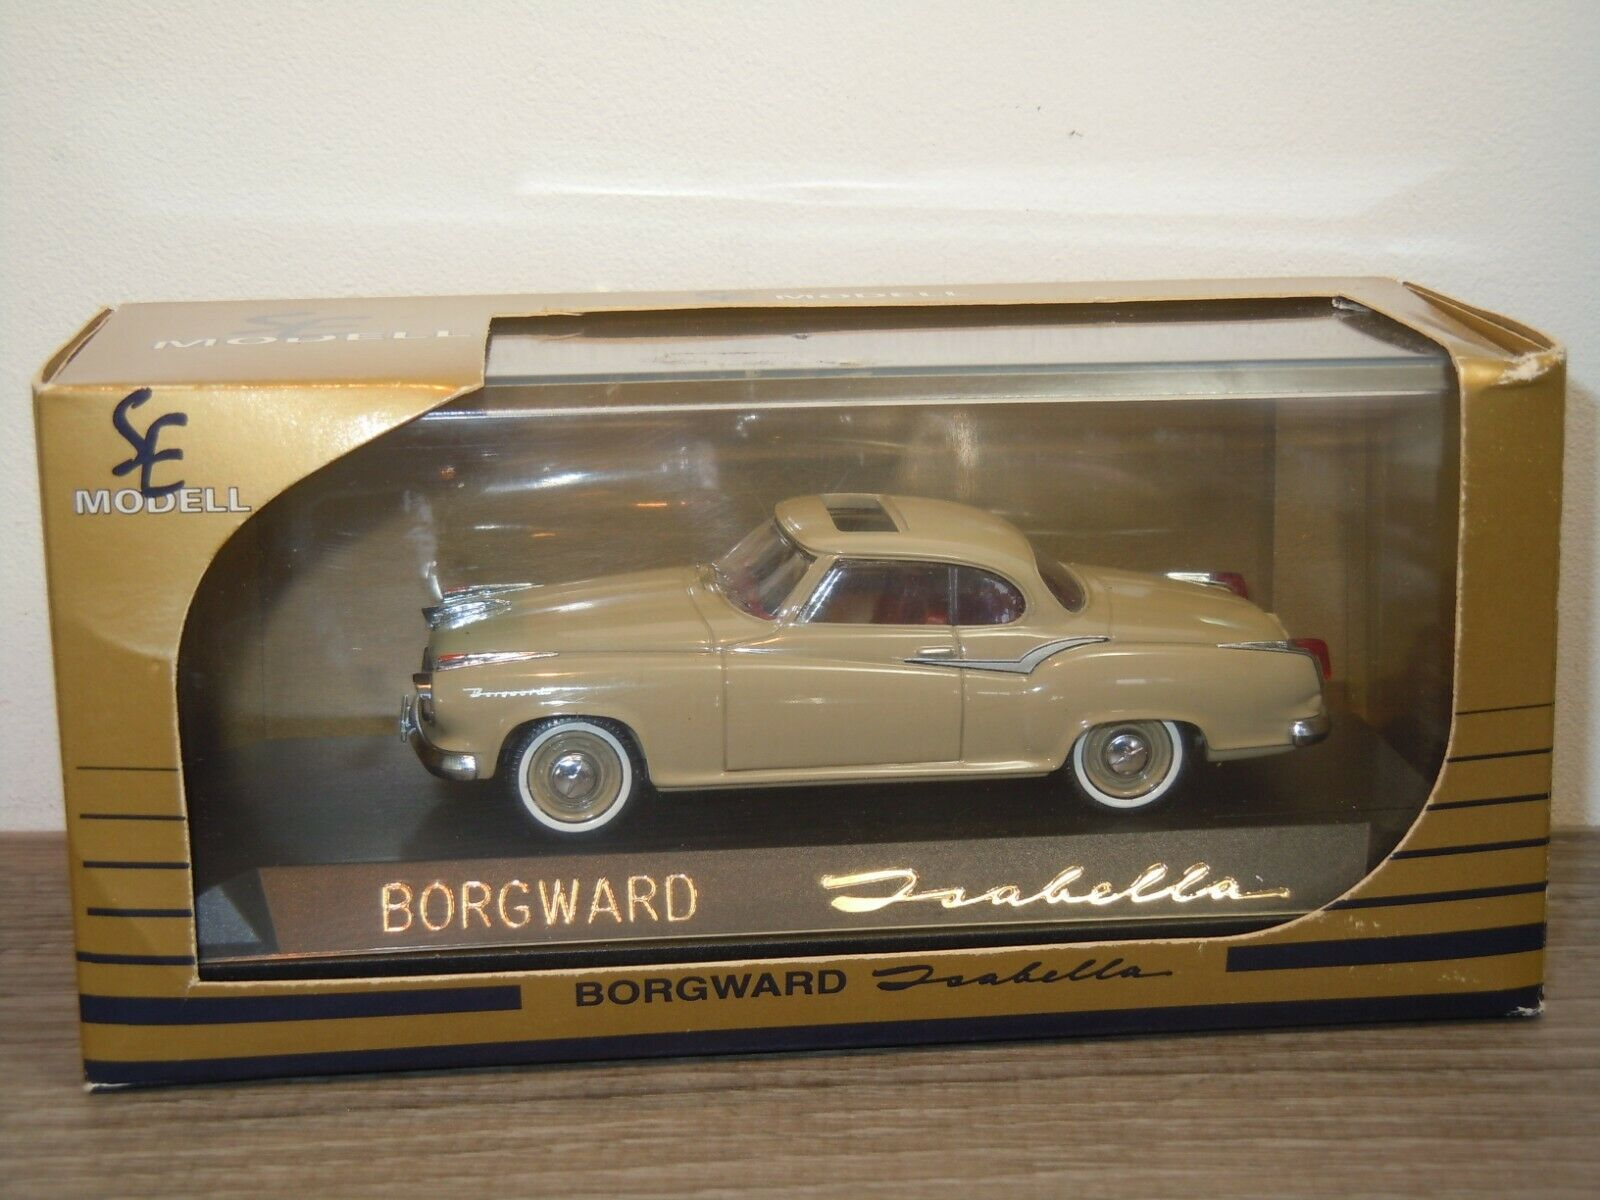 Borgward Isabella with Sunroof - Solido SE Modell 1 43 in Box 36727